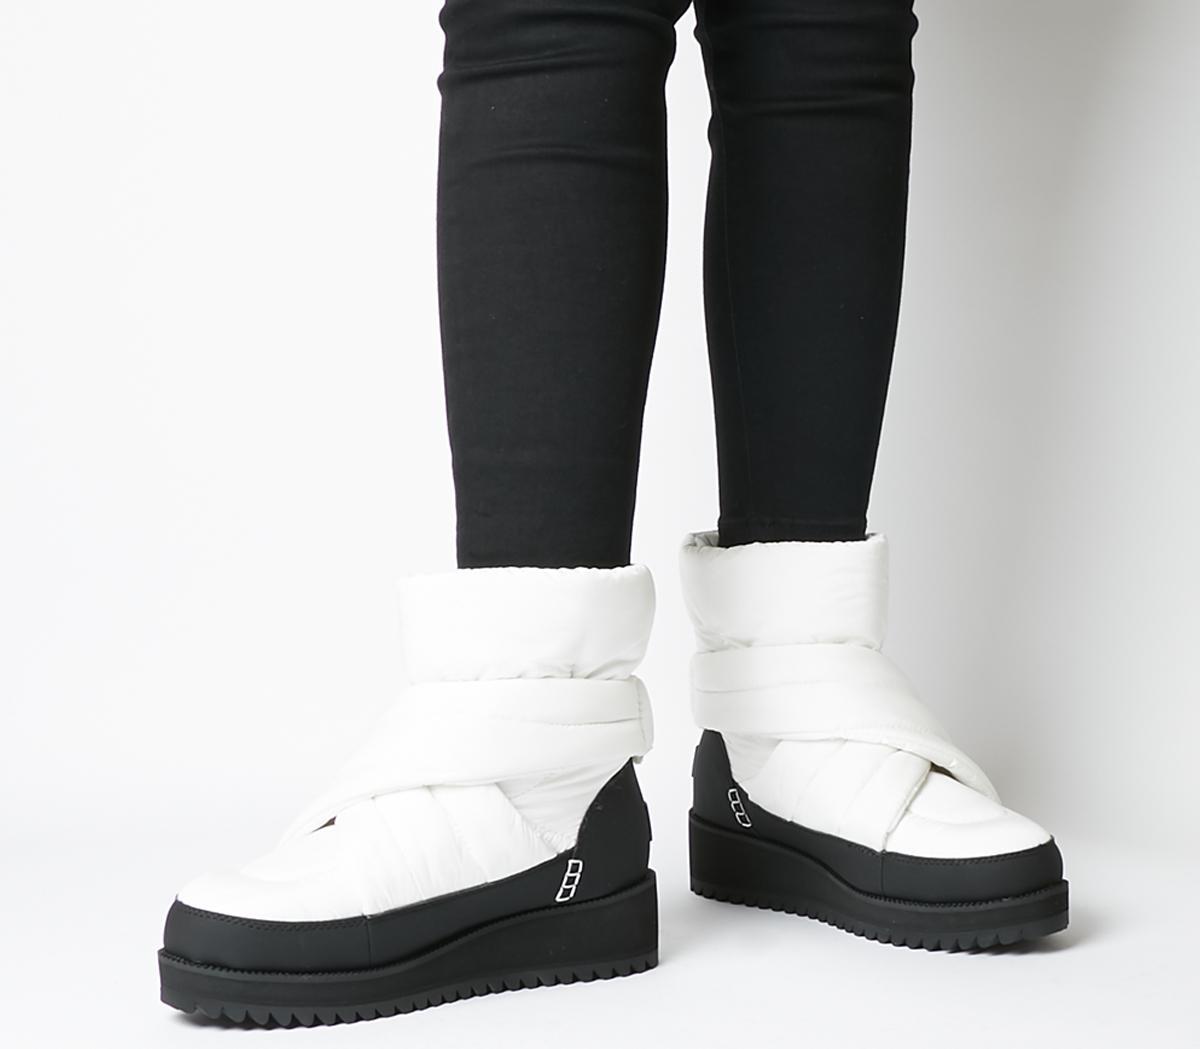 Montara Boots